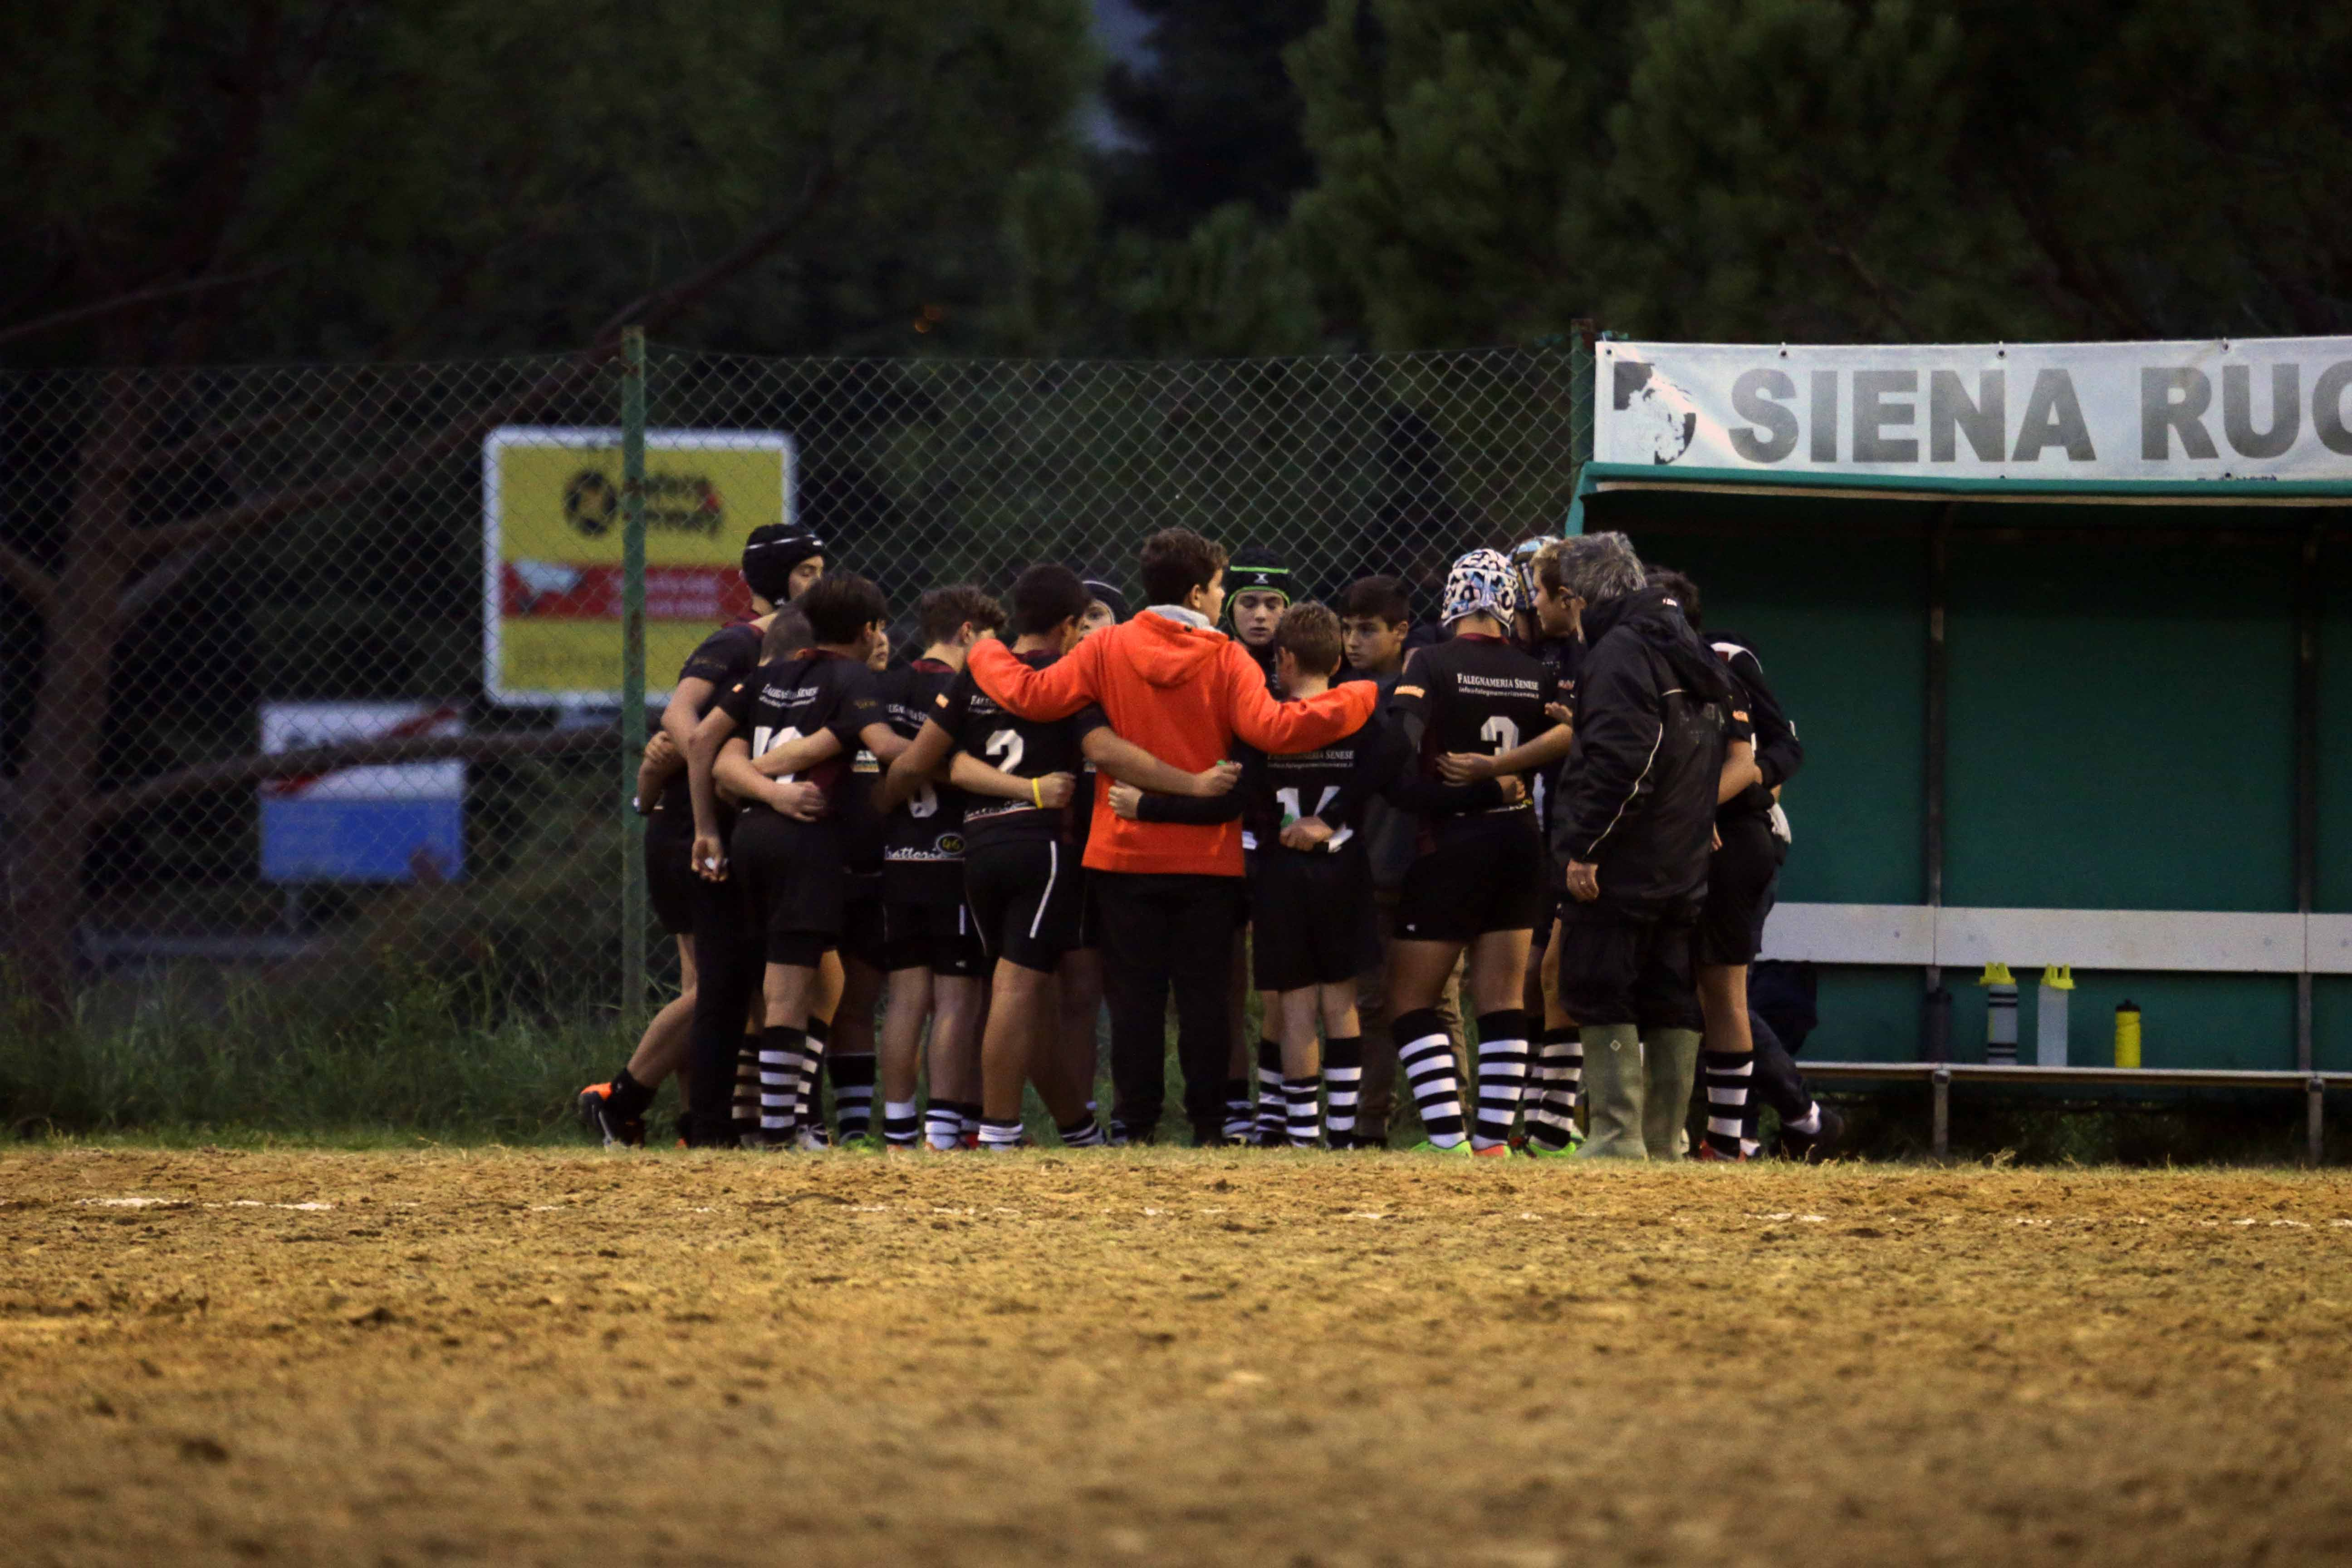 Under 14 Siena vs Livorno